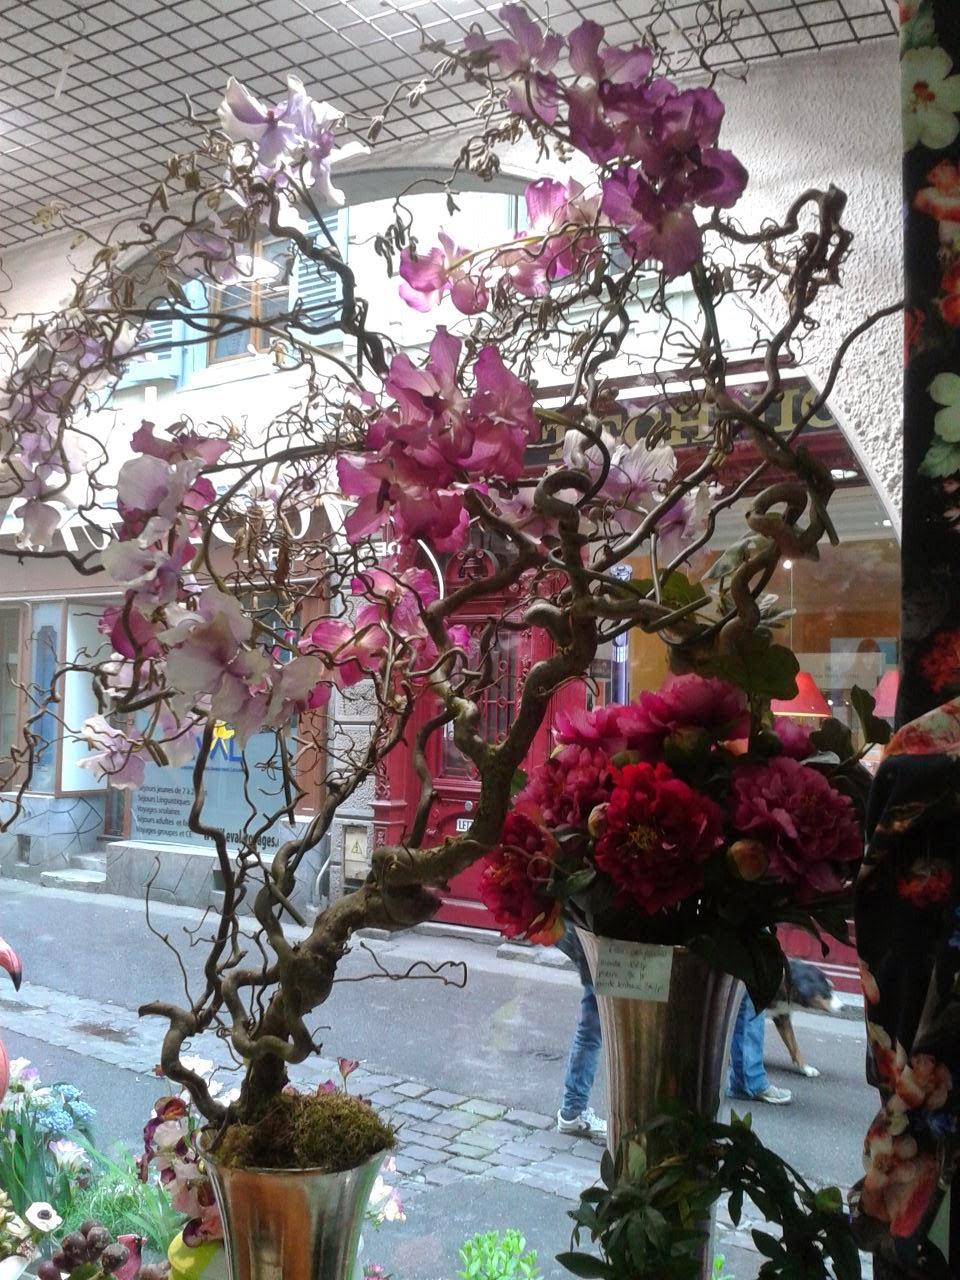 Home jasmin nouvelle vitrine printemps t 2014 - Decoration vitrine printemps ...